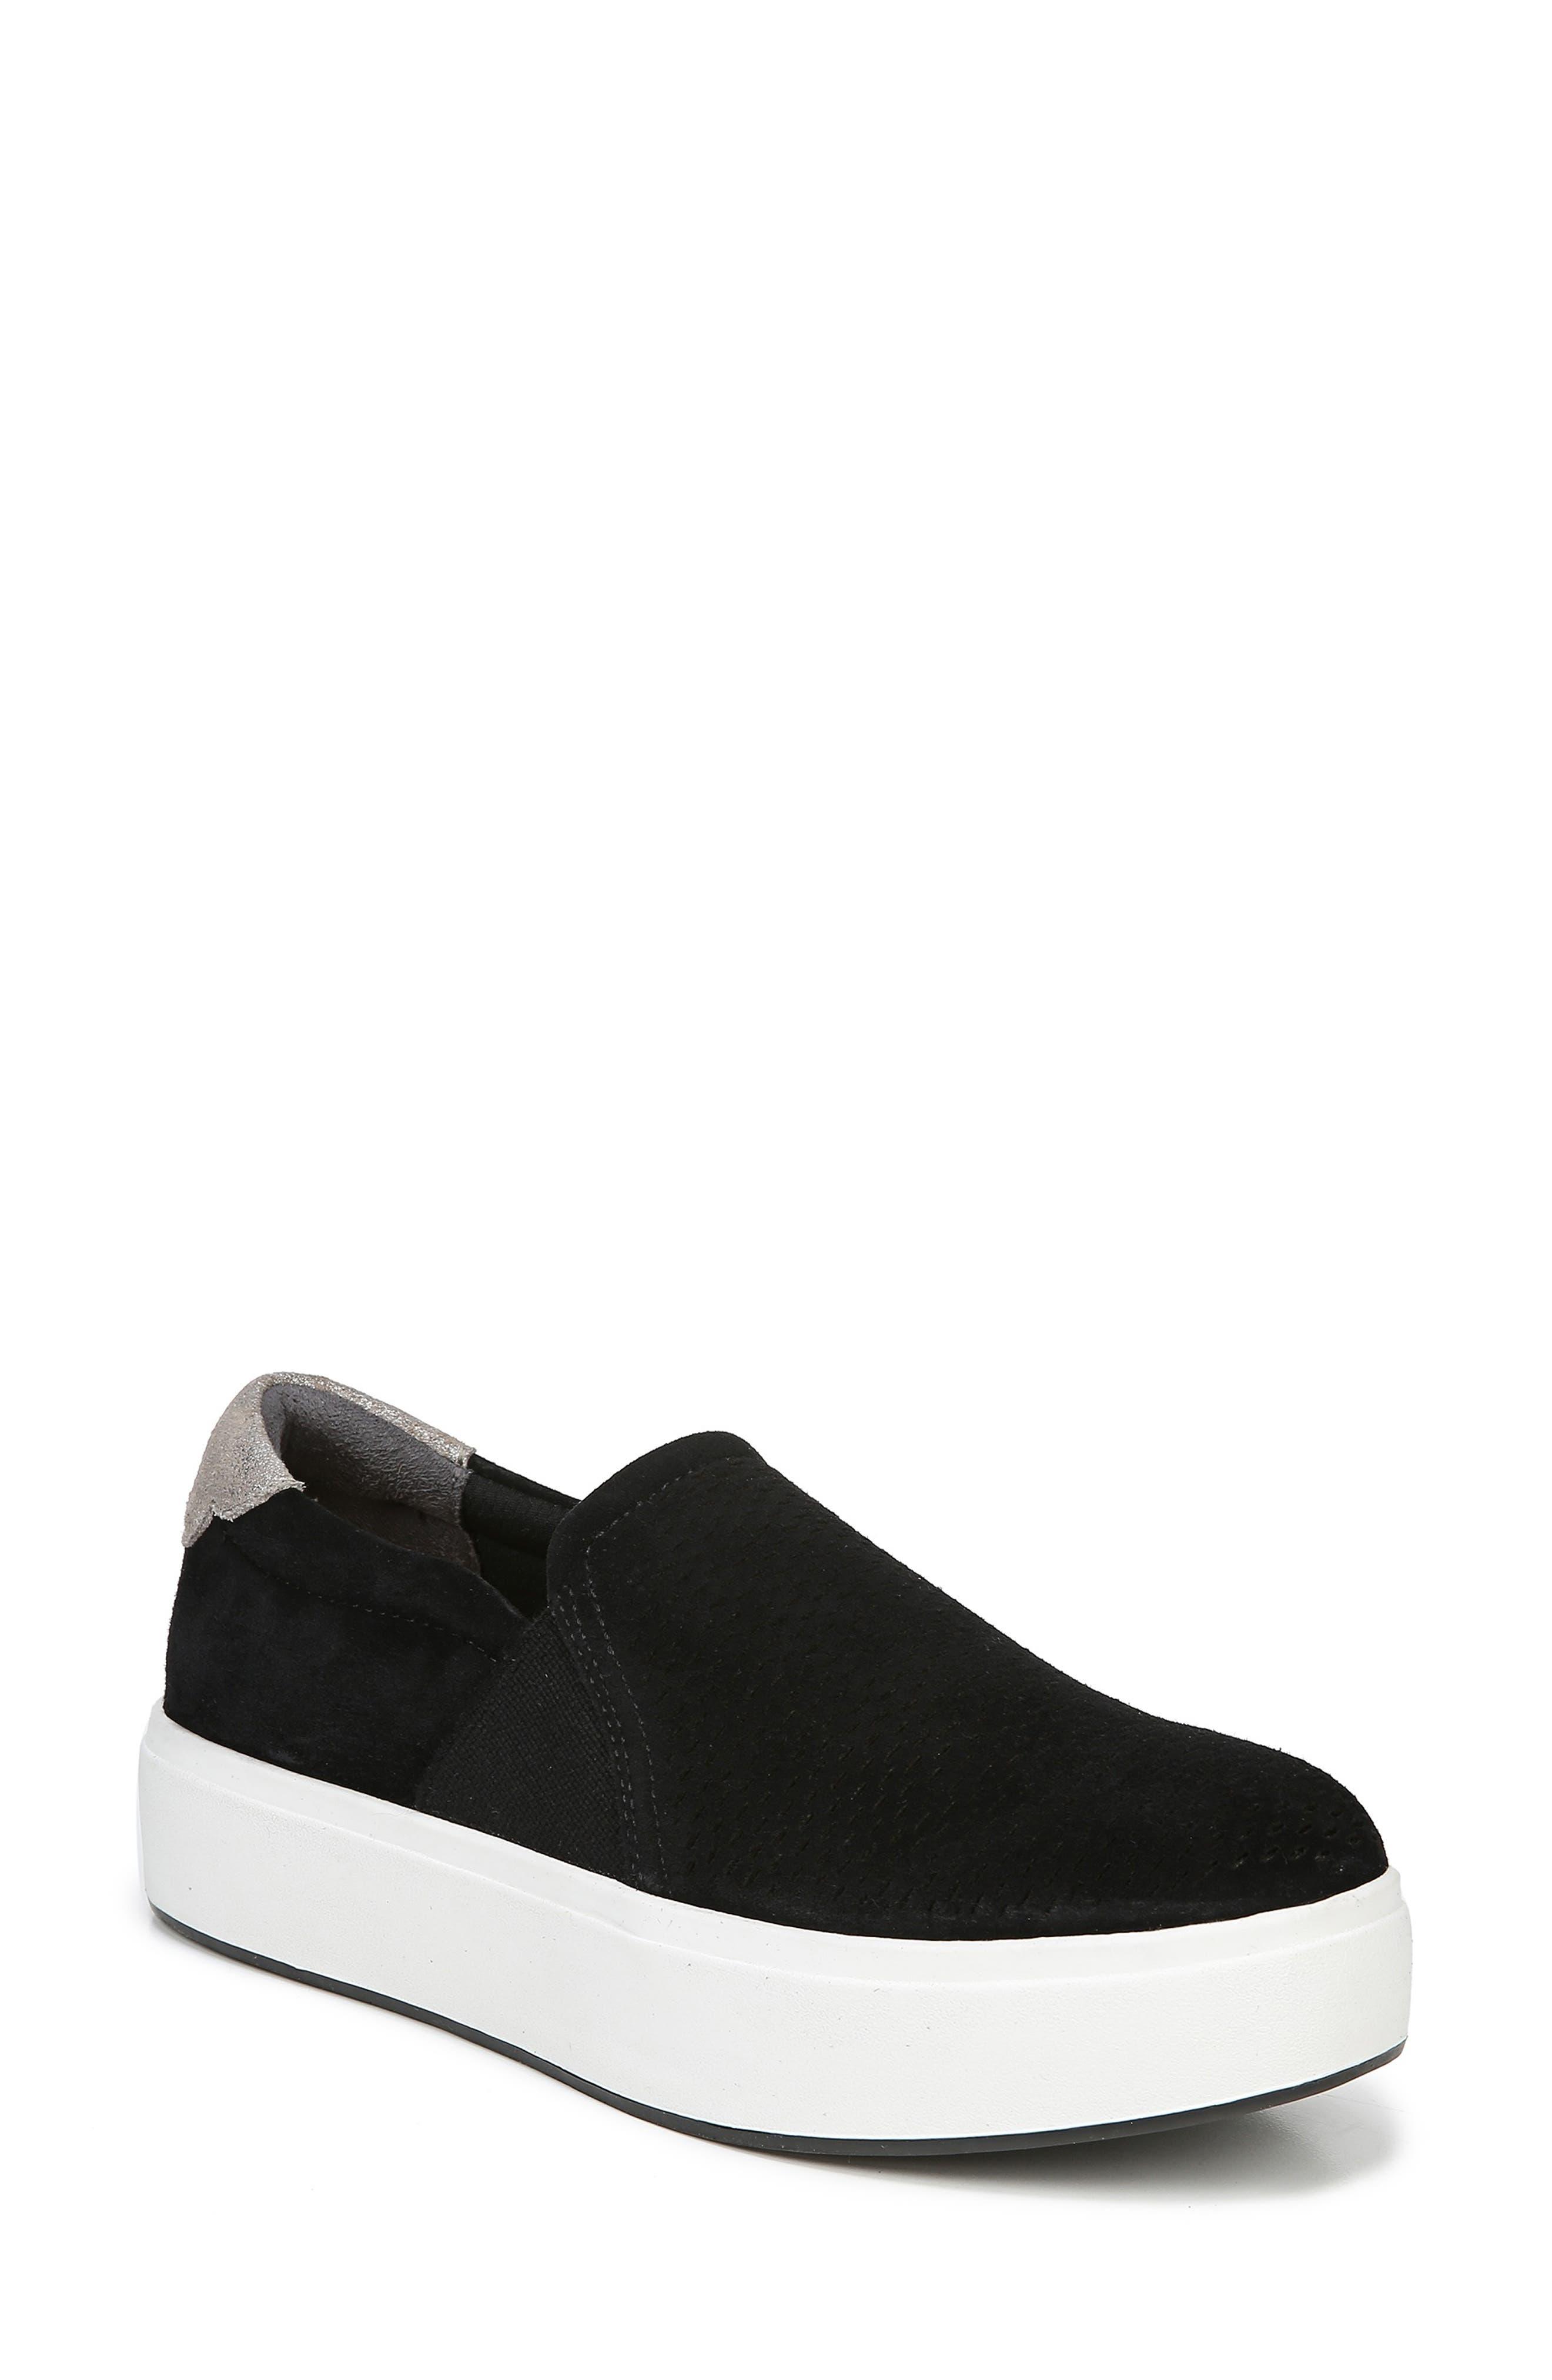 DR. SCHOLL'S, Abbot Lux Sneaker, Main thumbnail 1, color, BLACK SUEDE